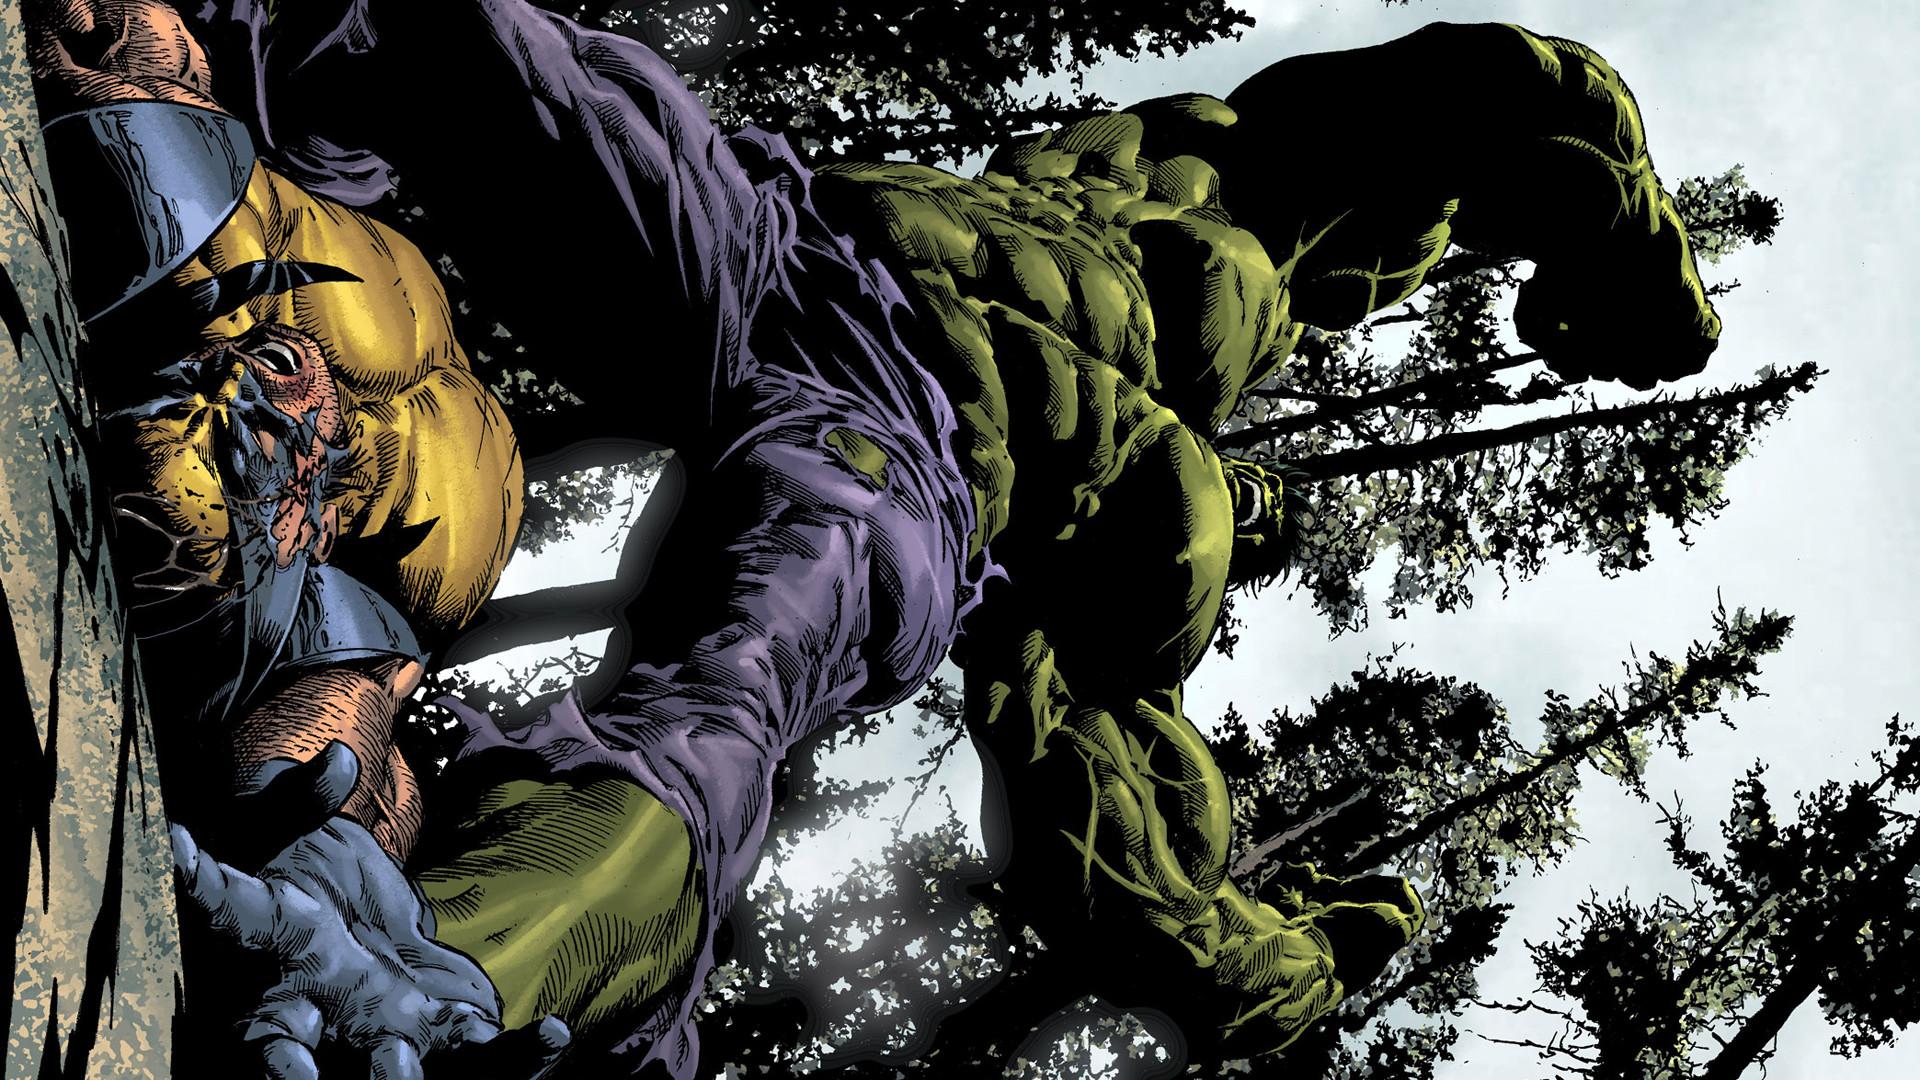 Res: 1920x1080, Hulk vs Wolverine hd wallpaper | Hulk, Wallpapers and Search